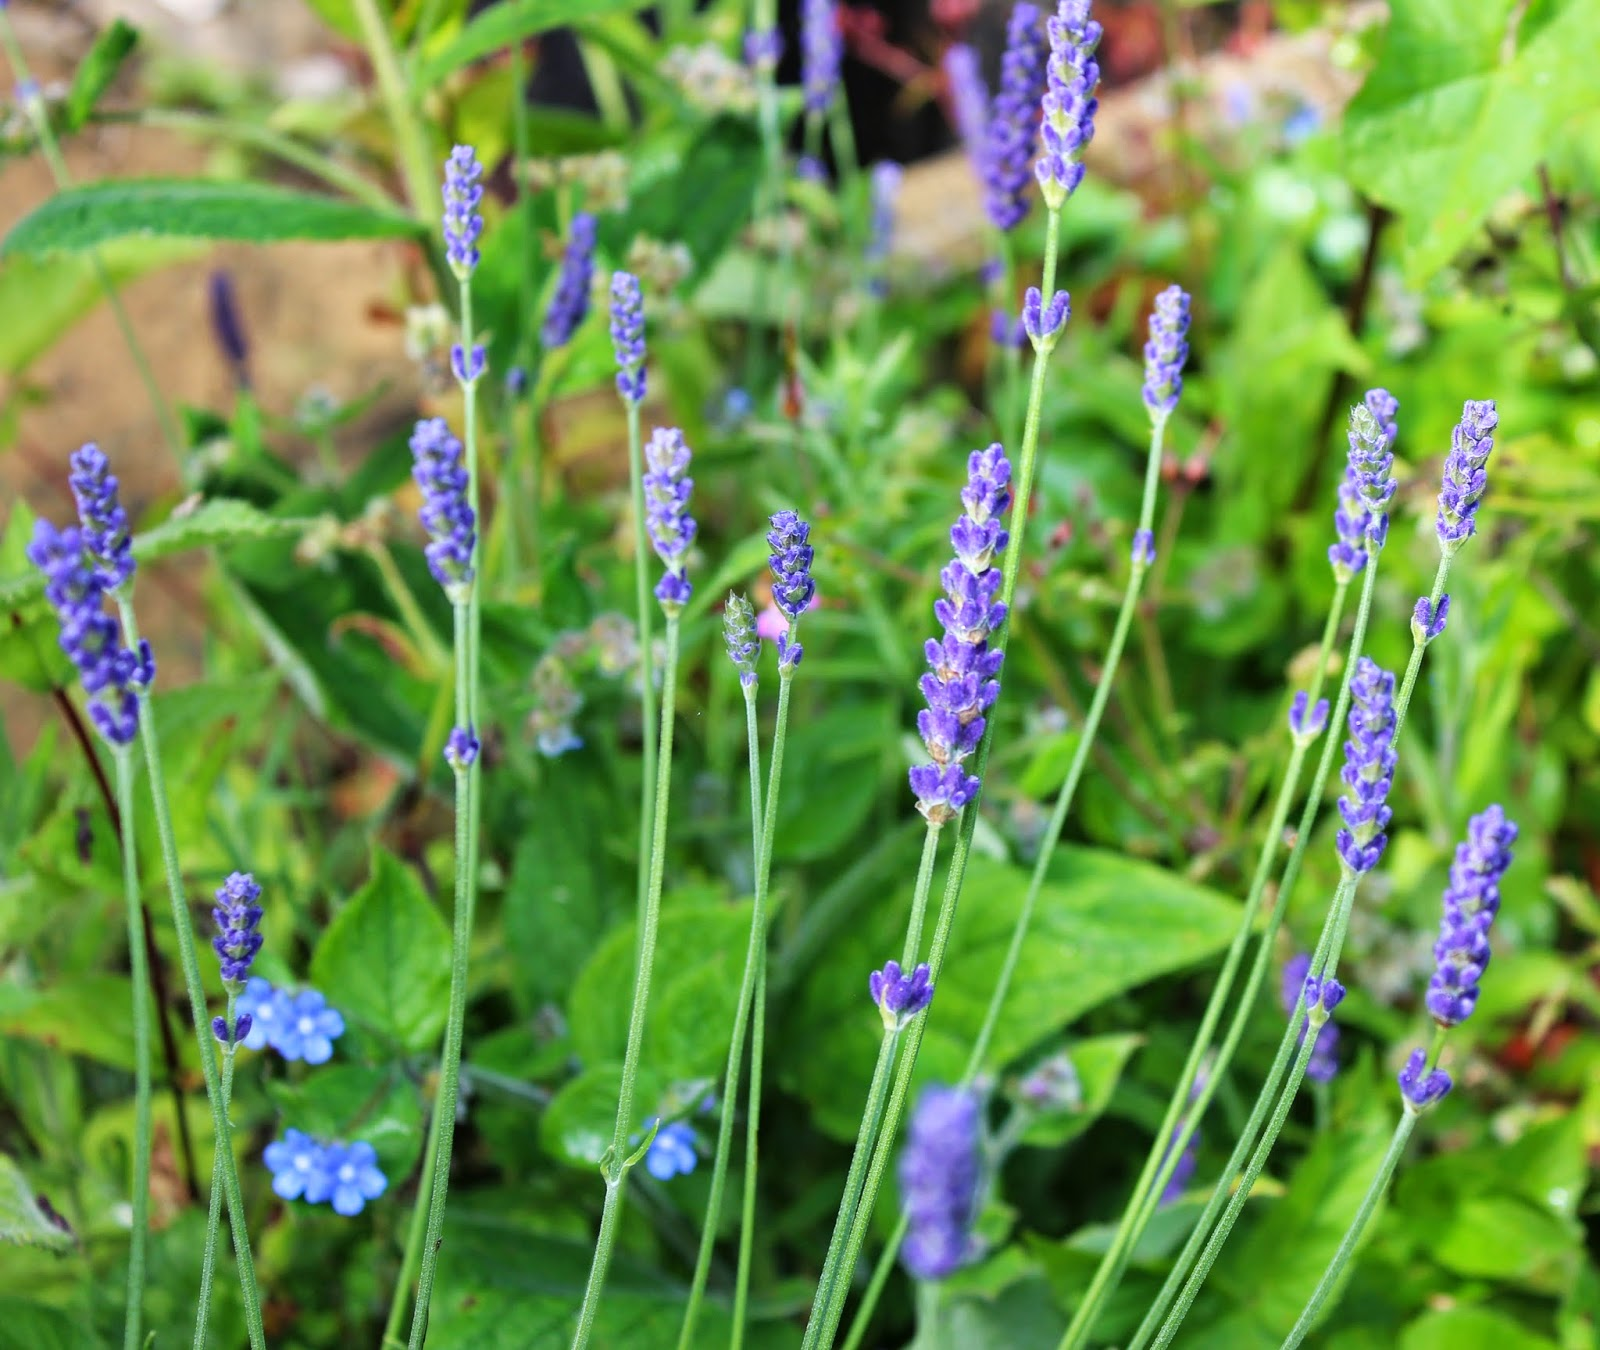 Snapshots of the Garden - How Does Your Garden Grow